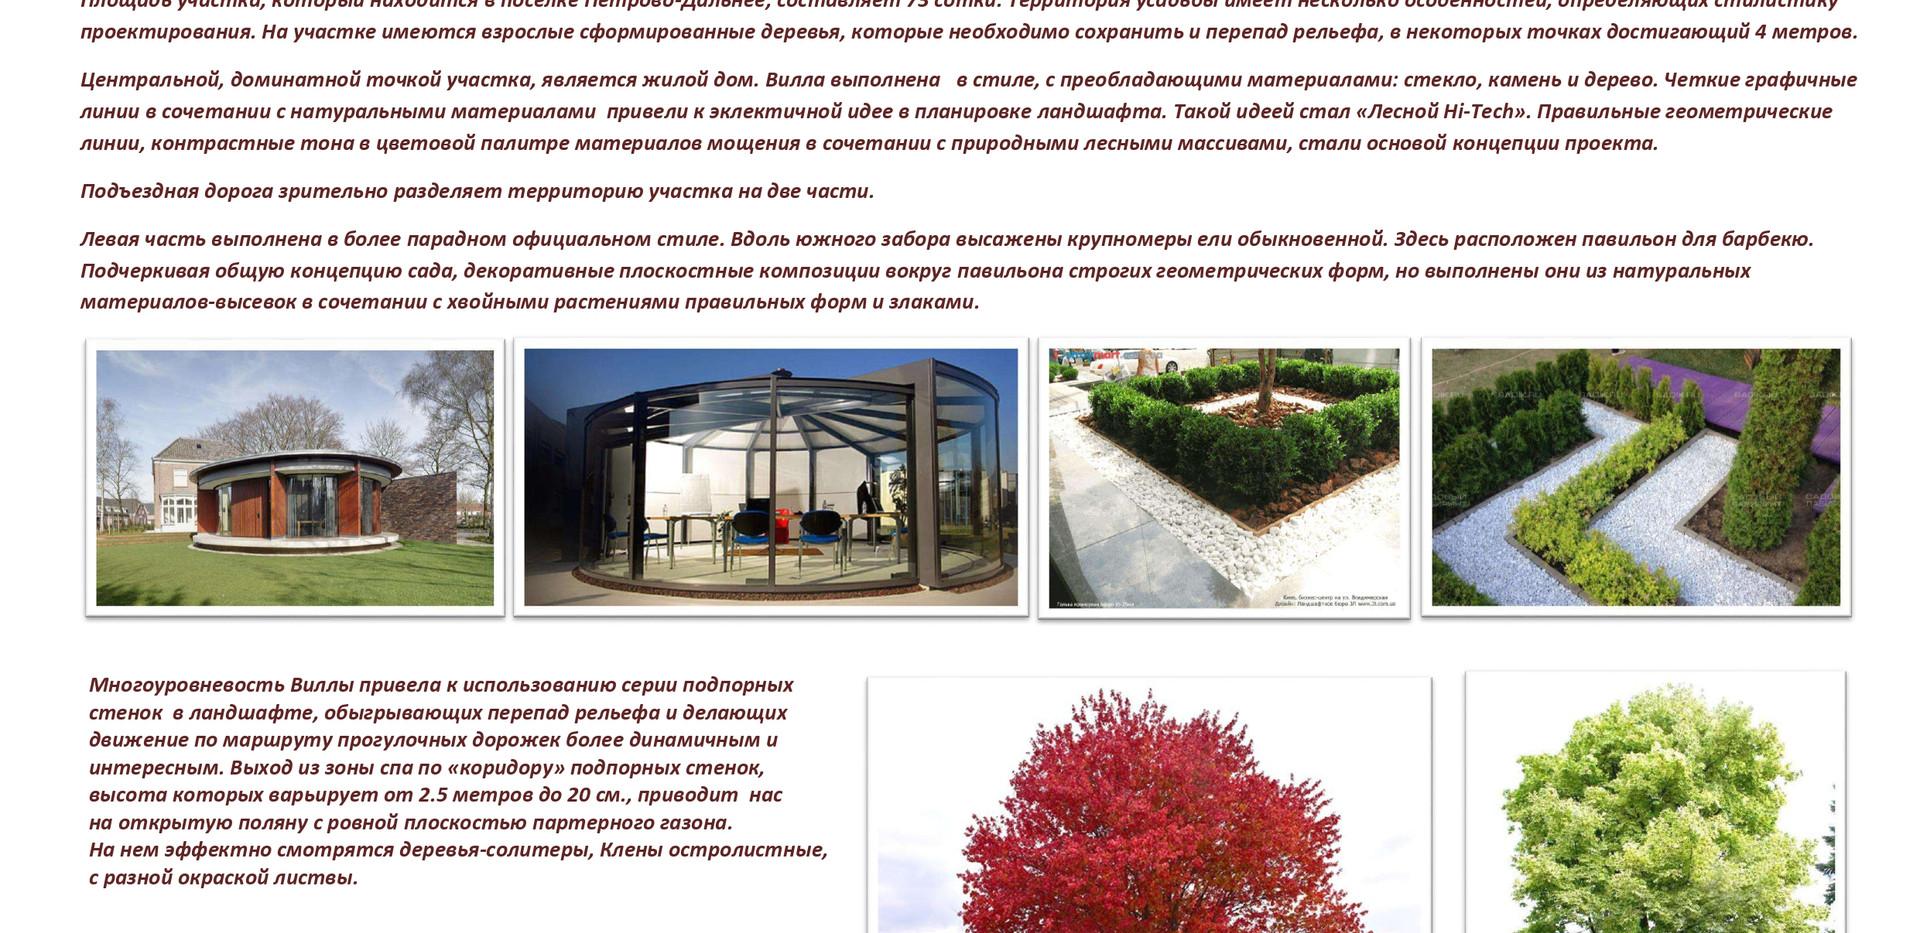 Концепт Петрово-Дальнее_ЛюксСад_pages-to